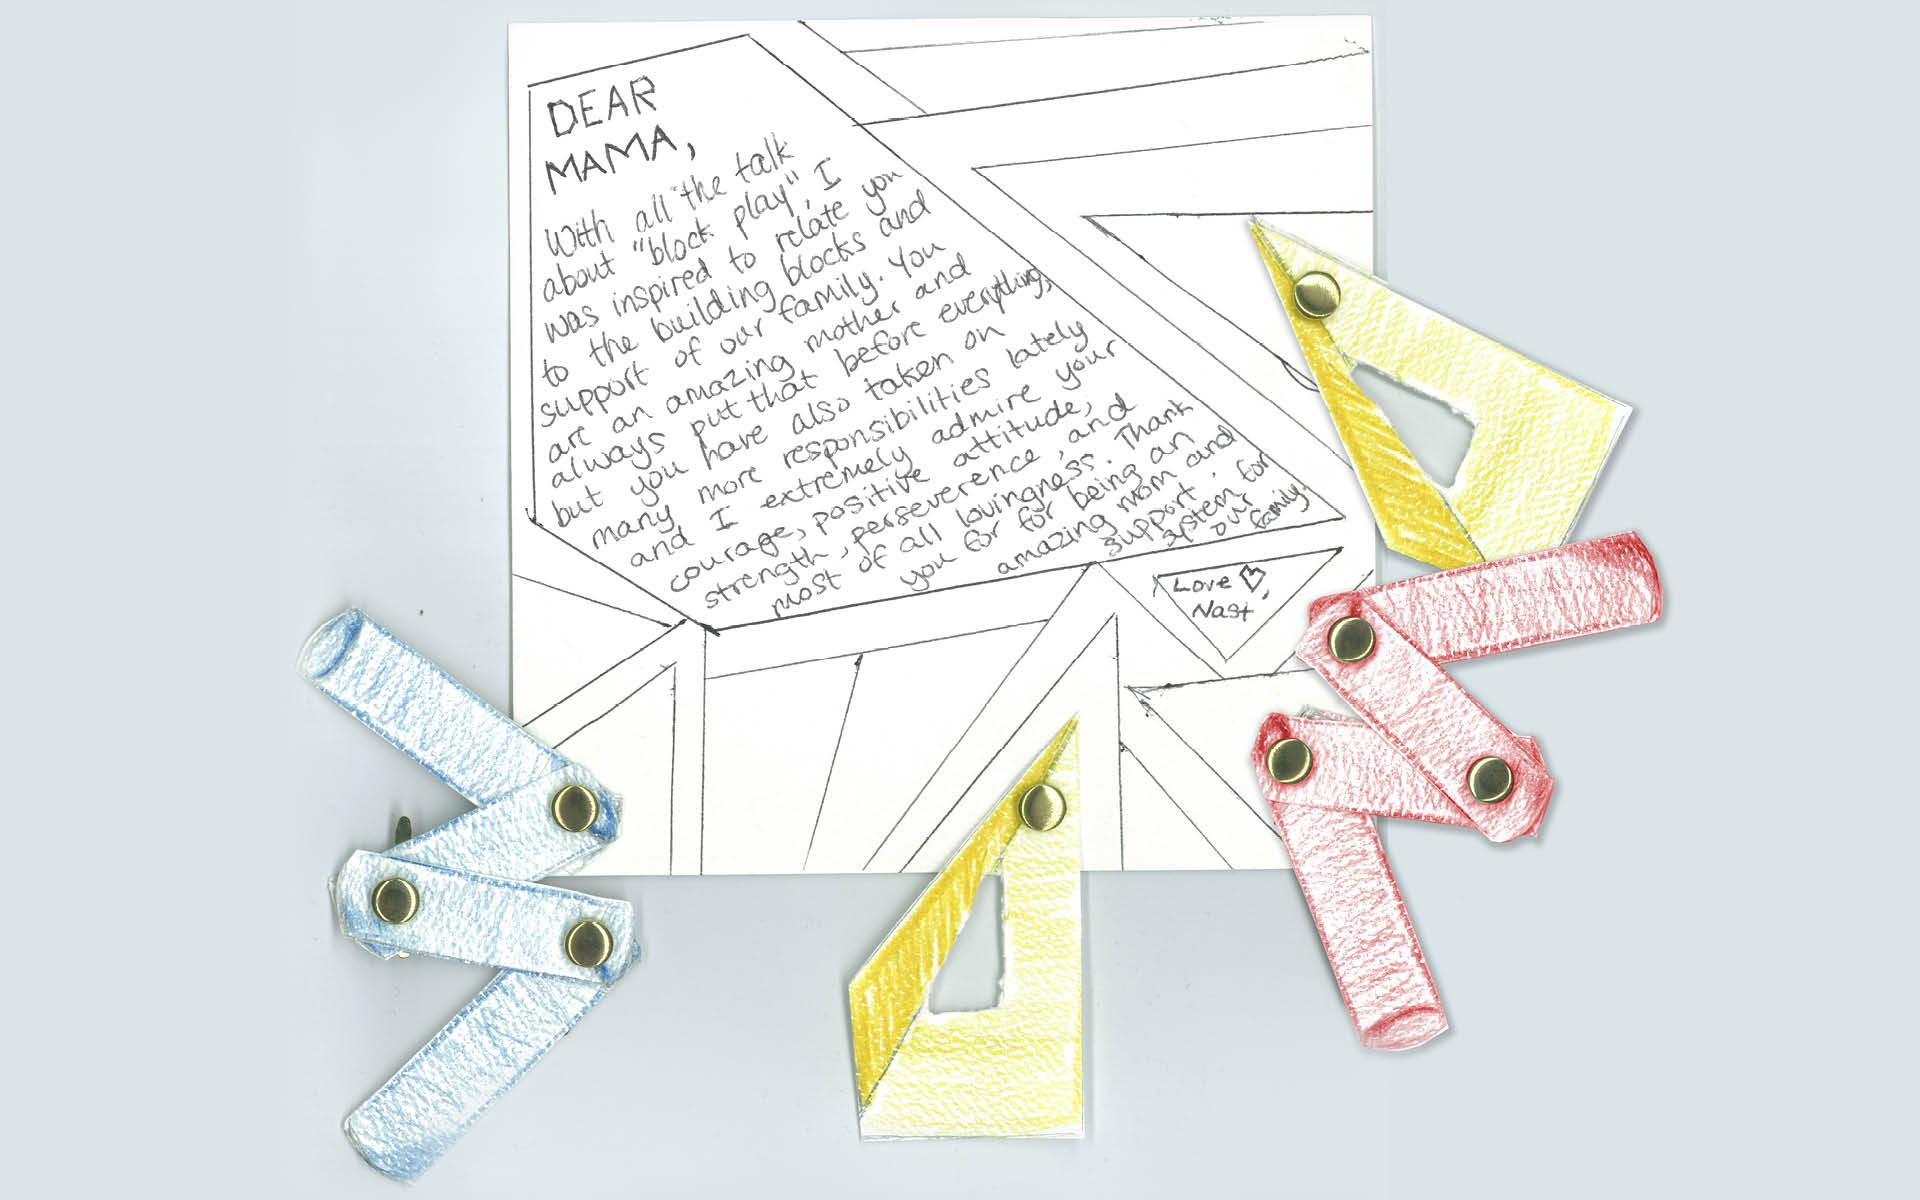 creative teens, architect on demand, advice without strings, DIY Like a Hummingbird